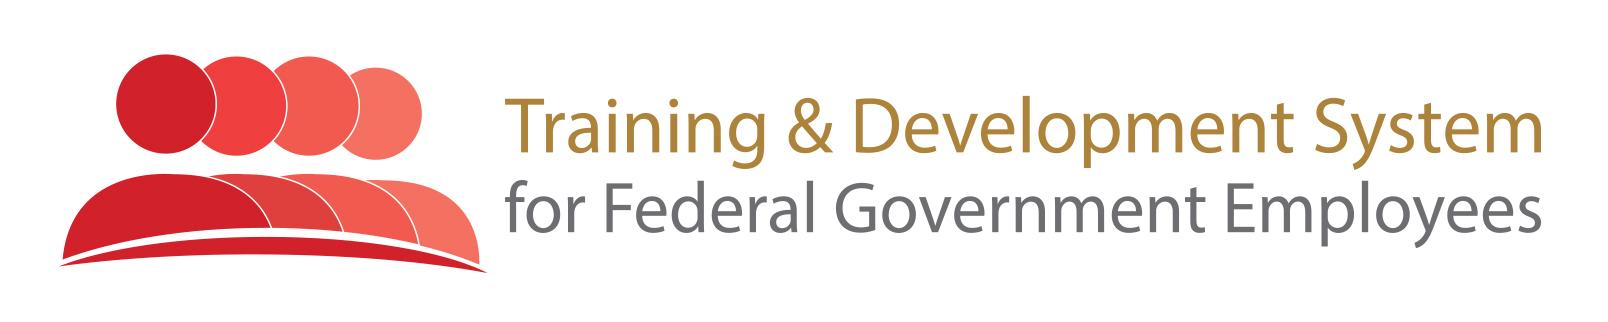 Training & Development System Logo